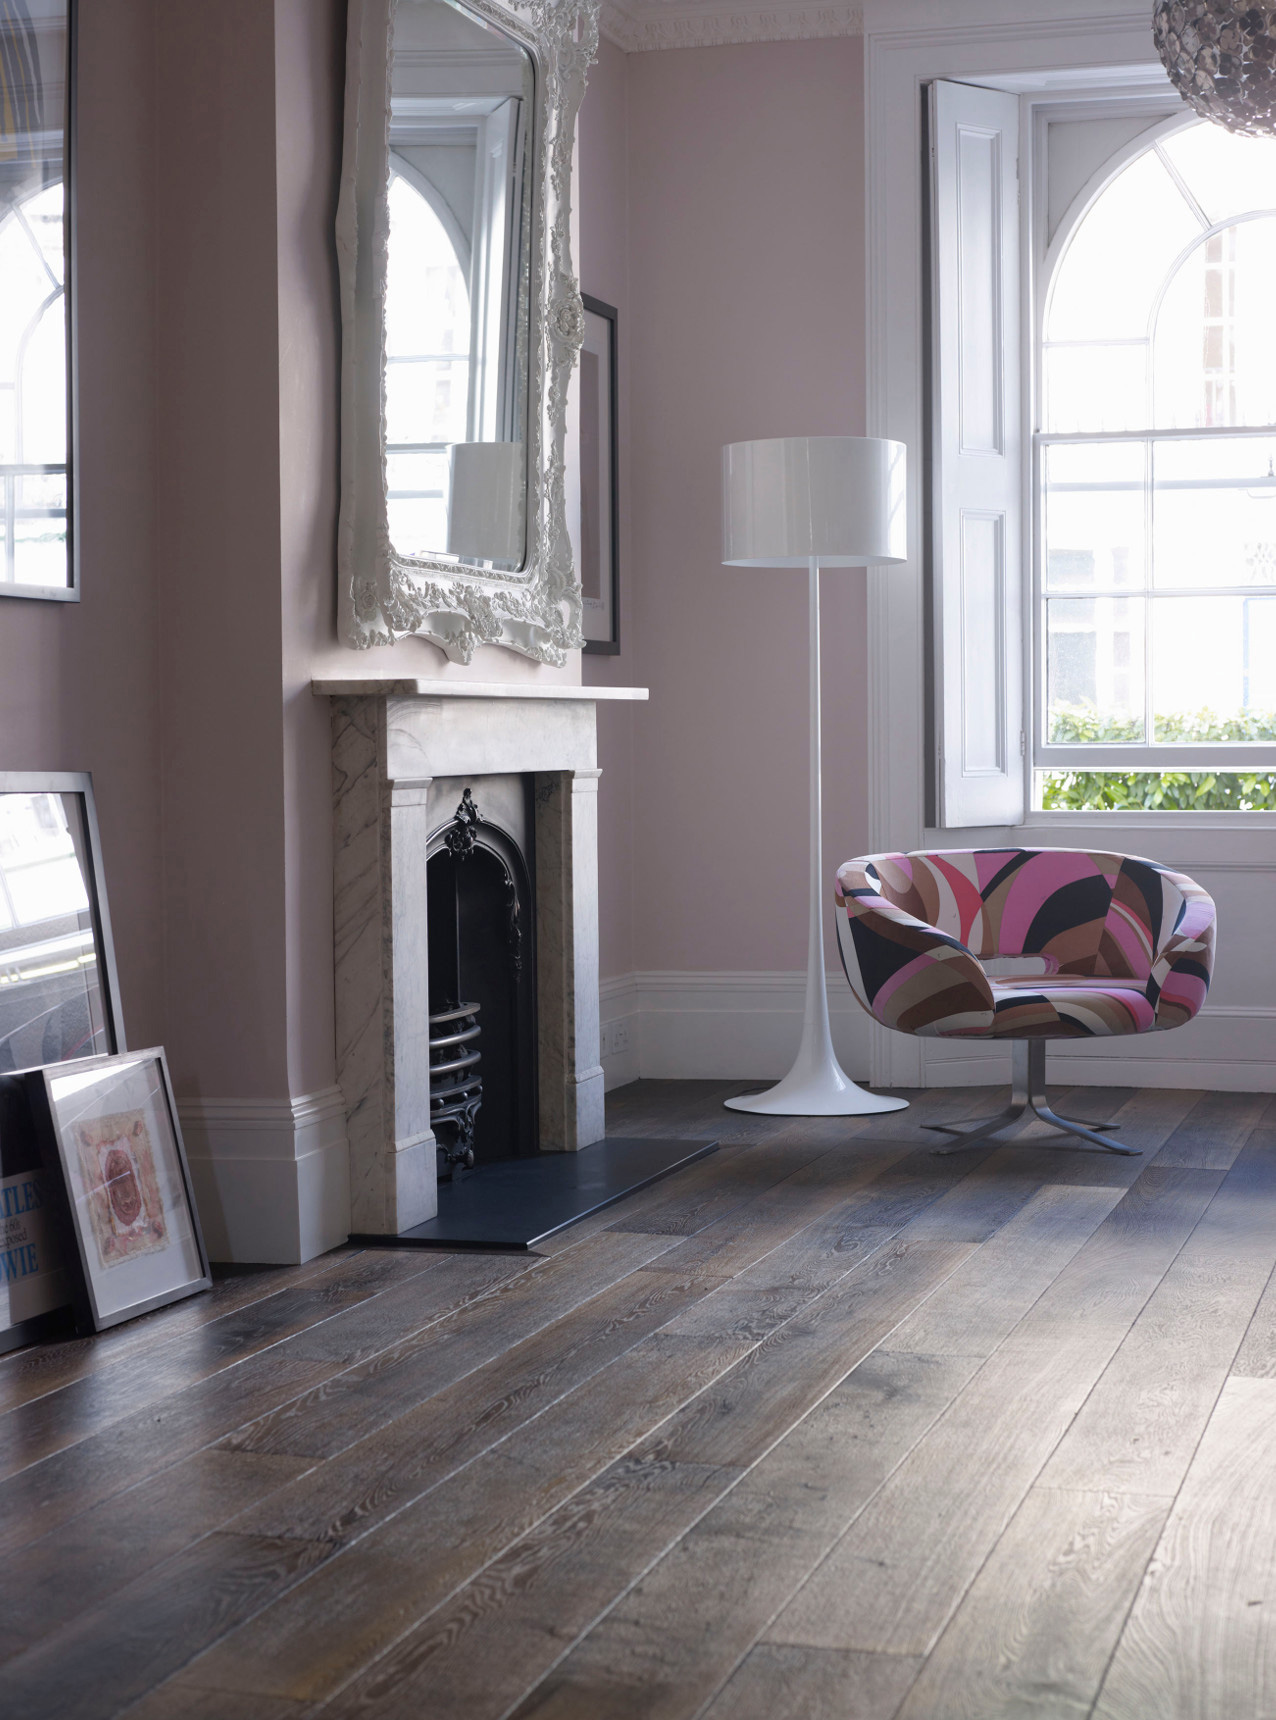 Oak Landmark Killerton plank dark brown engineered floor with pink walls fireplace and pink chair